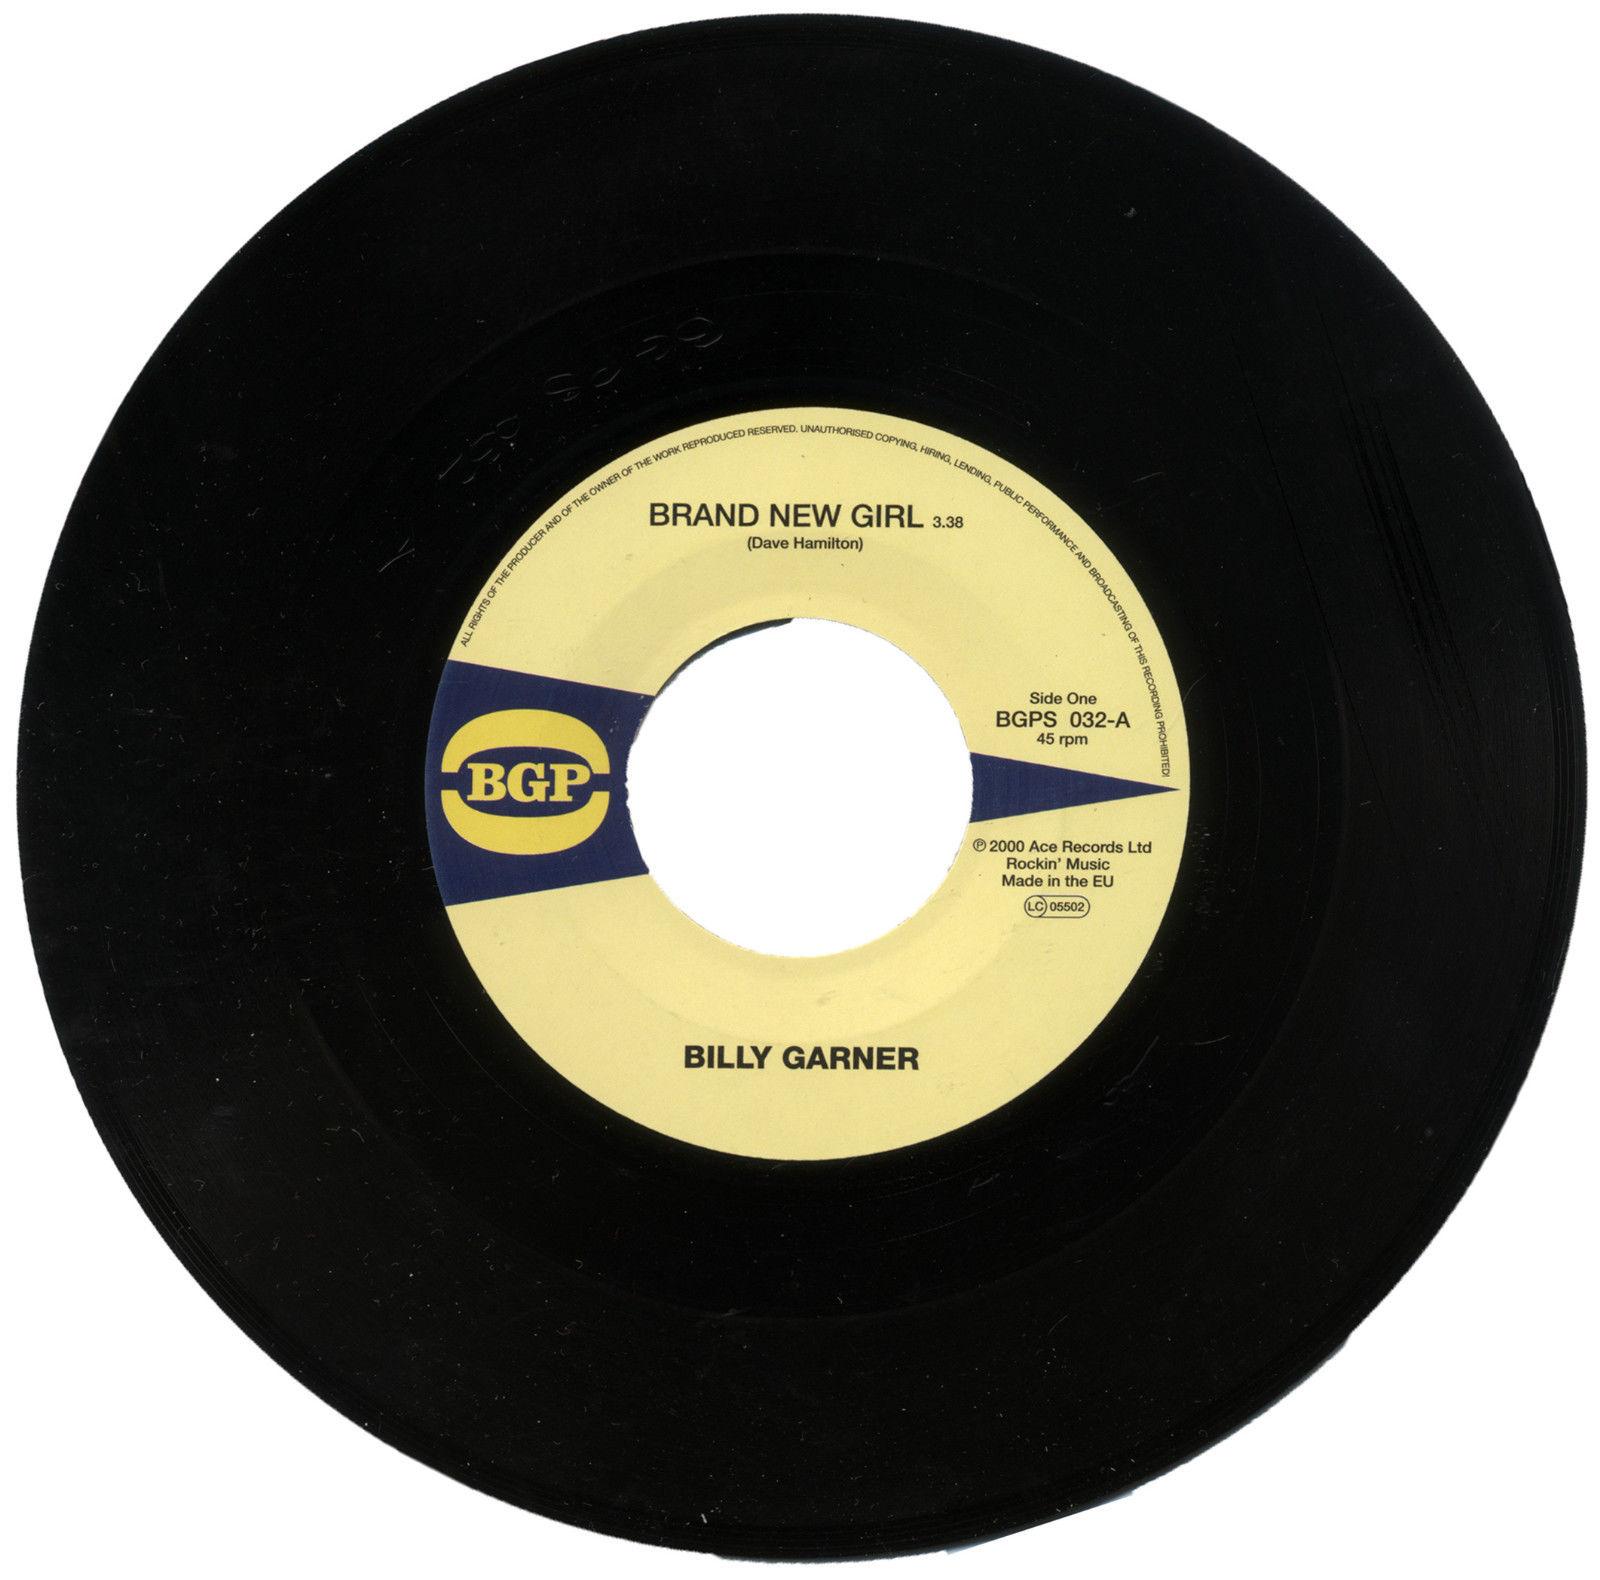 Billy Garner – Brand New Girl / I Got Some (Part 1) 45 (BGP) 7″ Vinyl